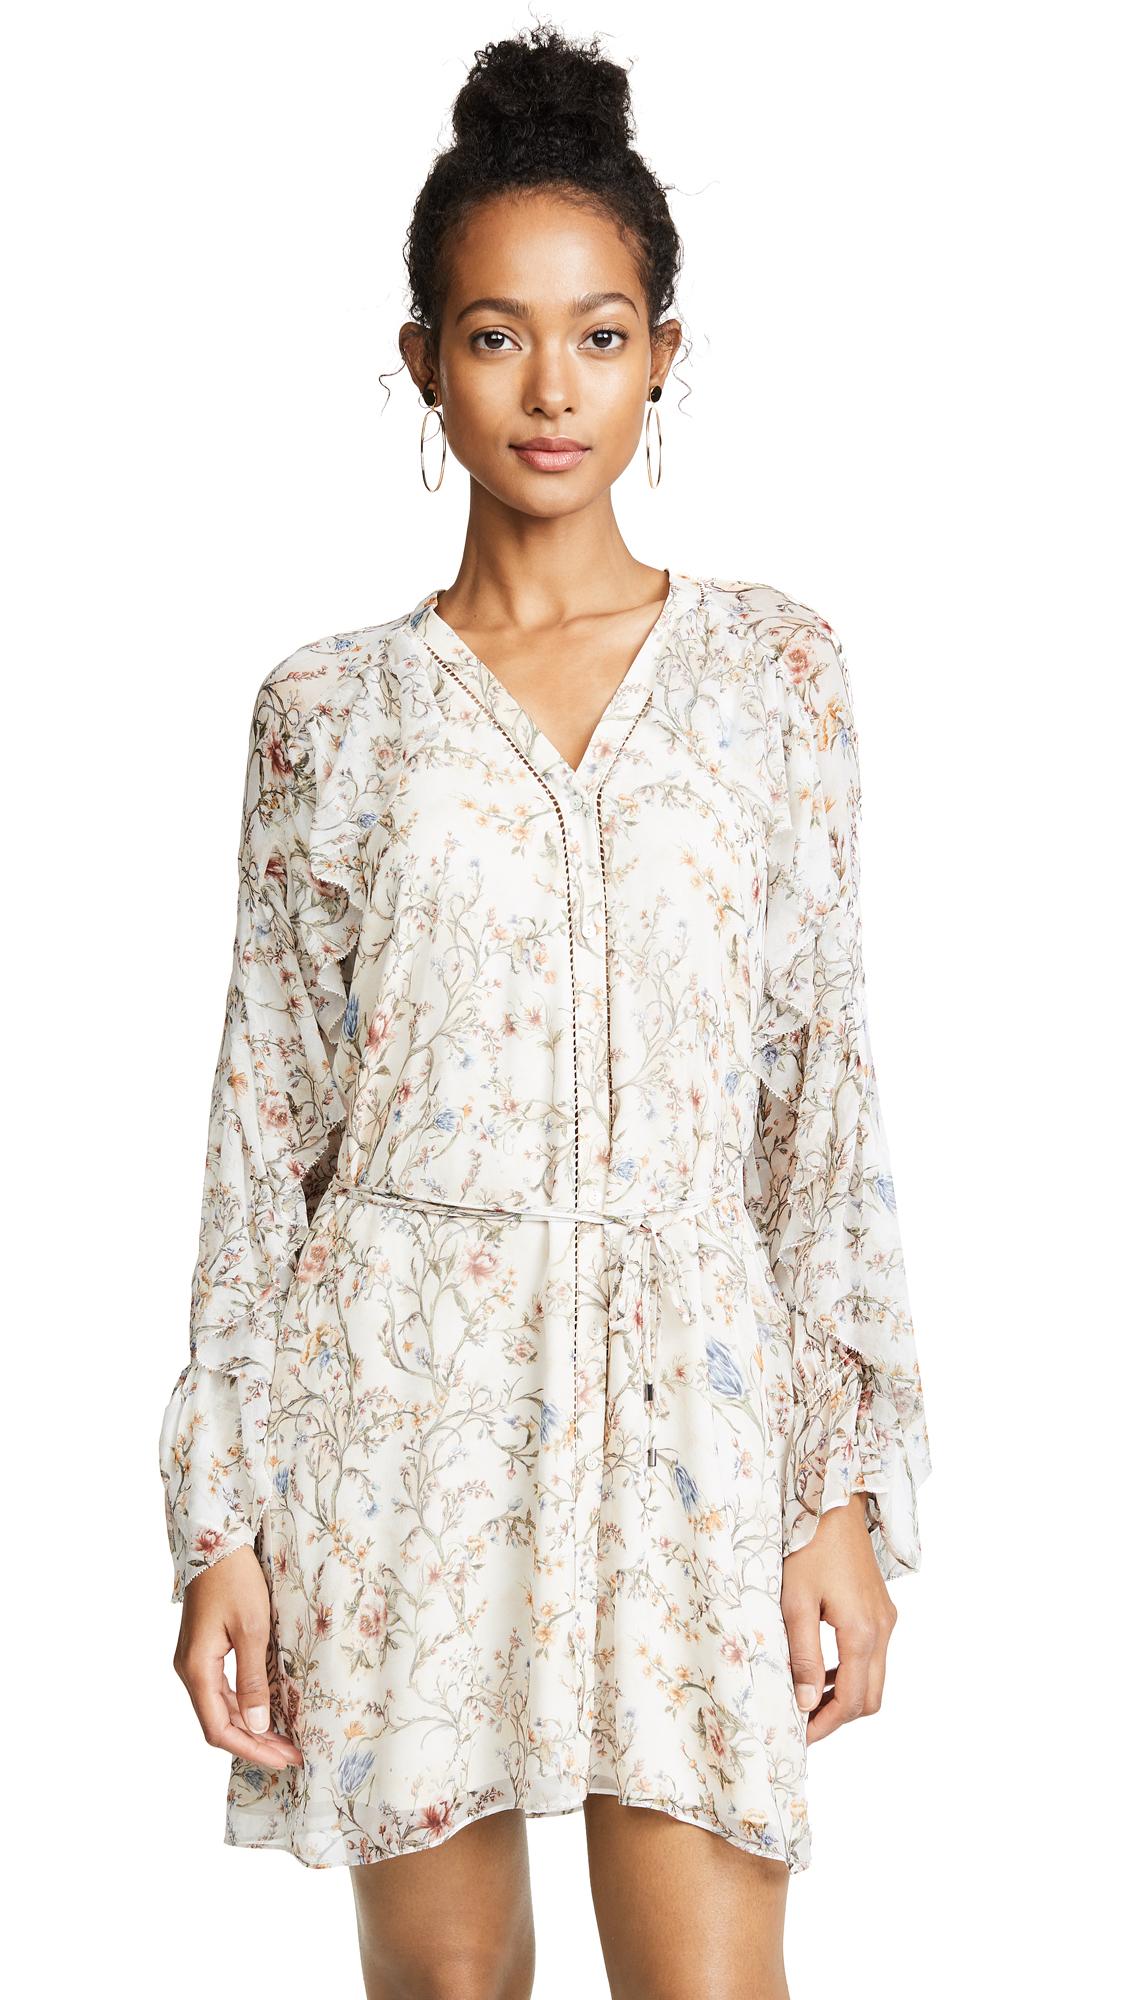 Haute Hippie Romani Ruffle Dress